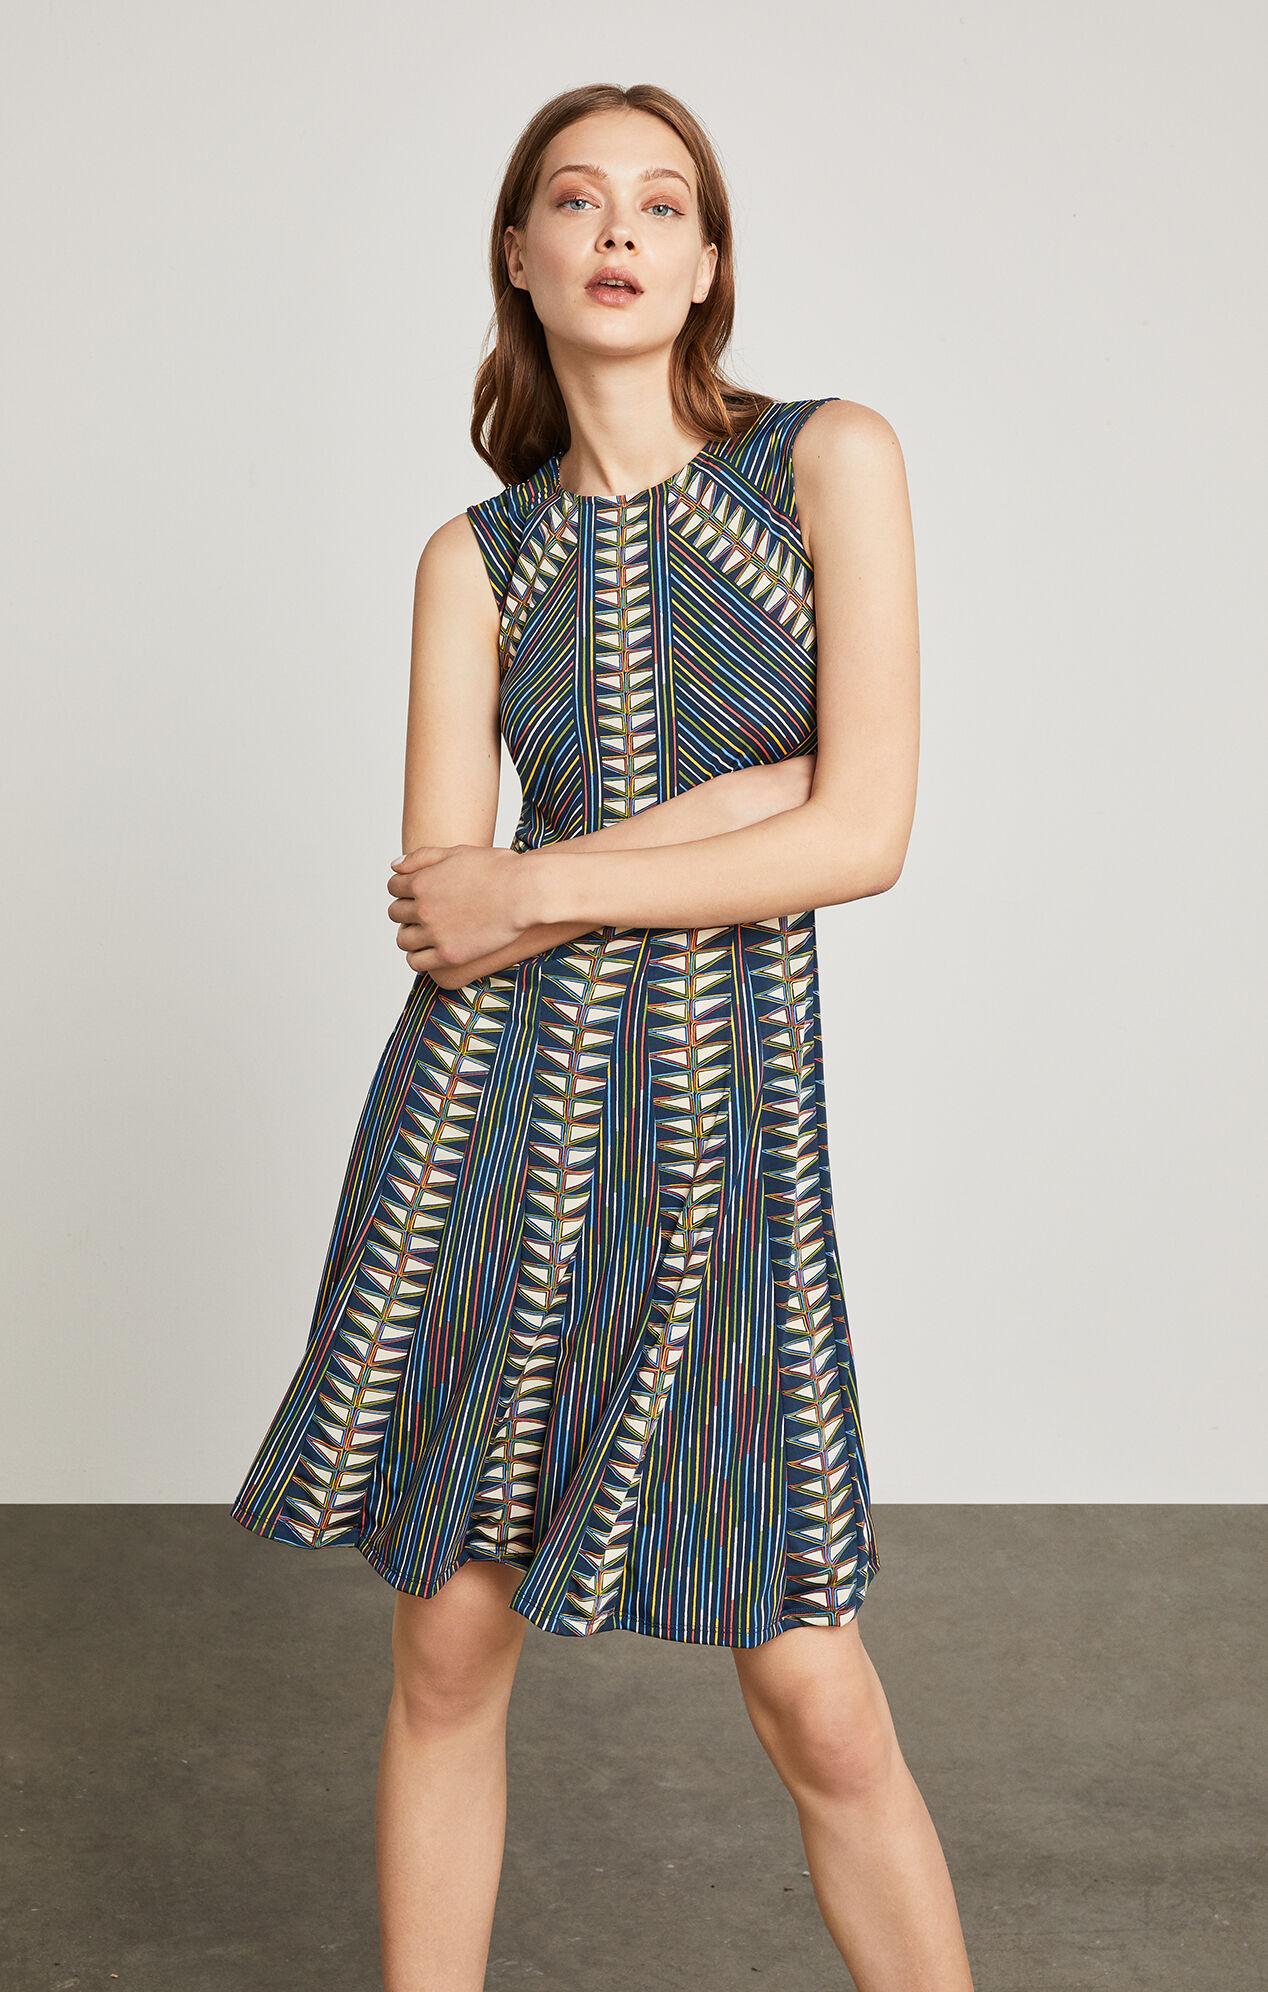 Rosalya Neon Triangles-Print Dress